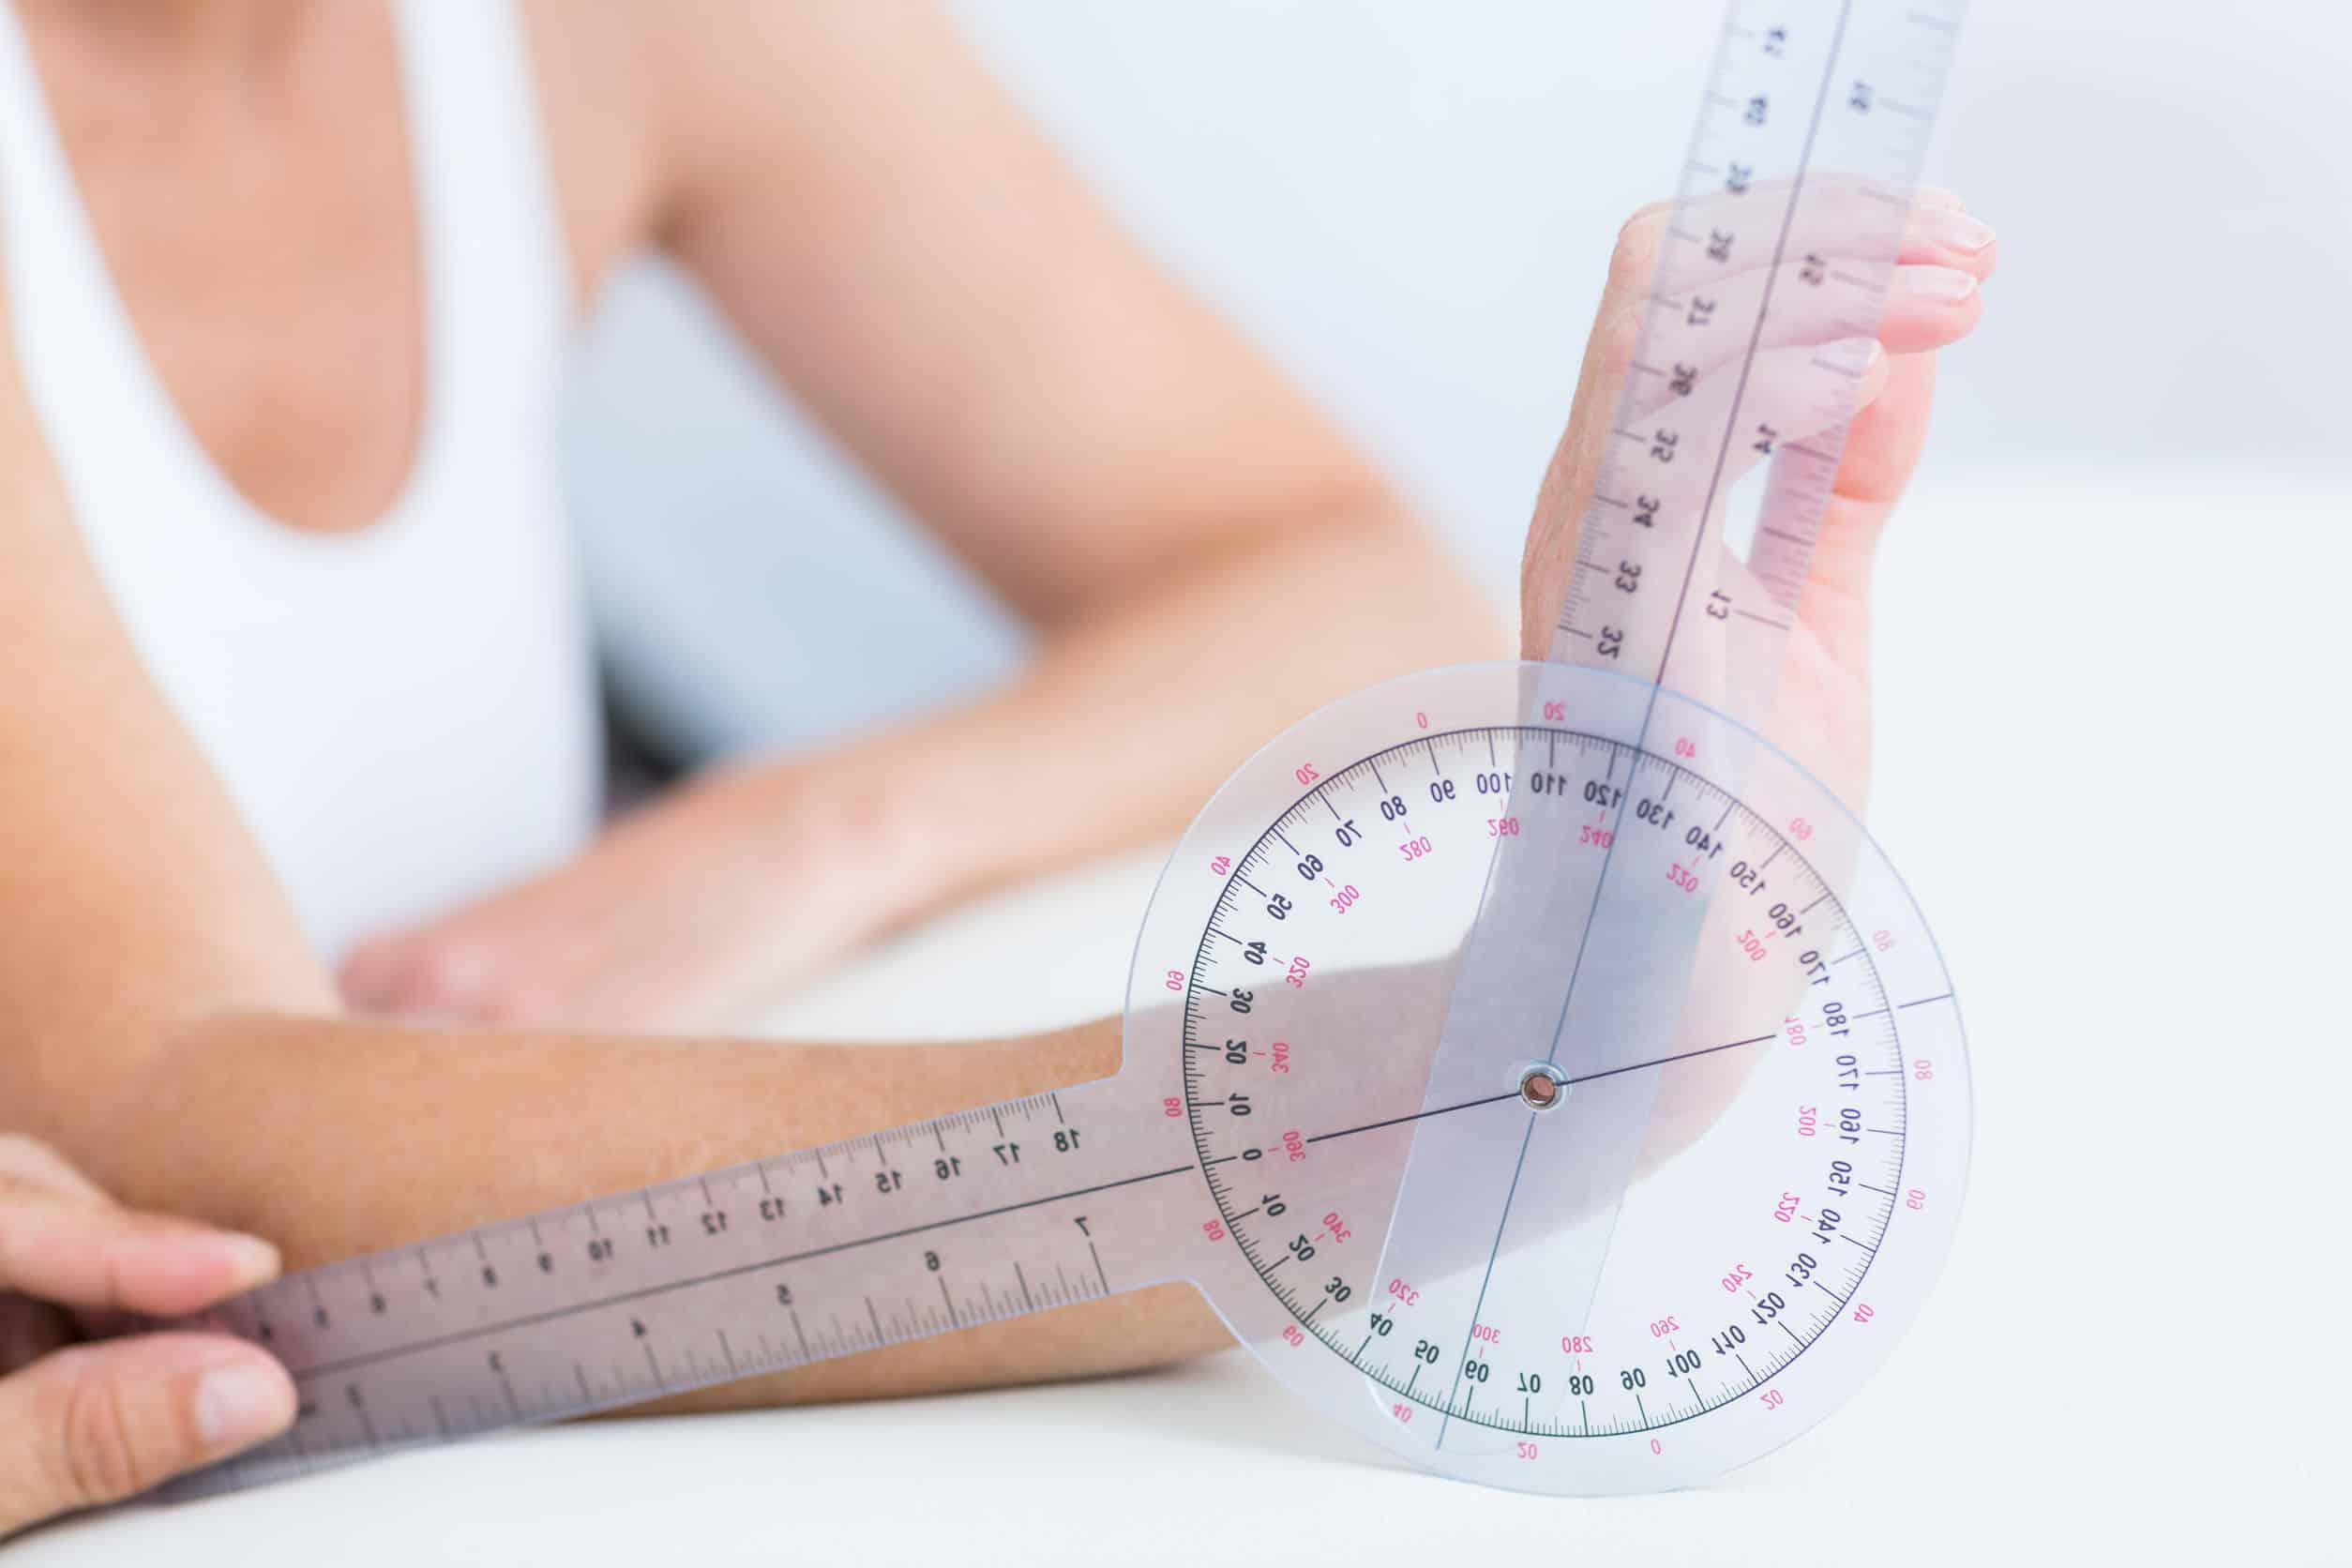 Imagem de um goniômetro.